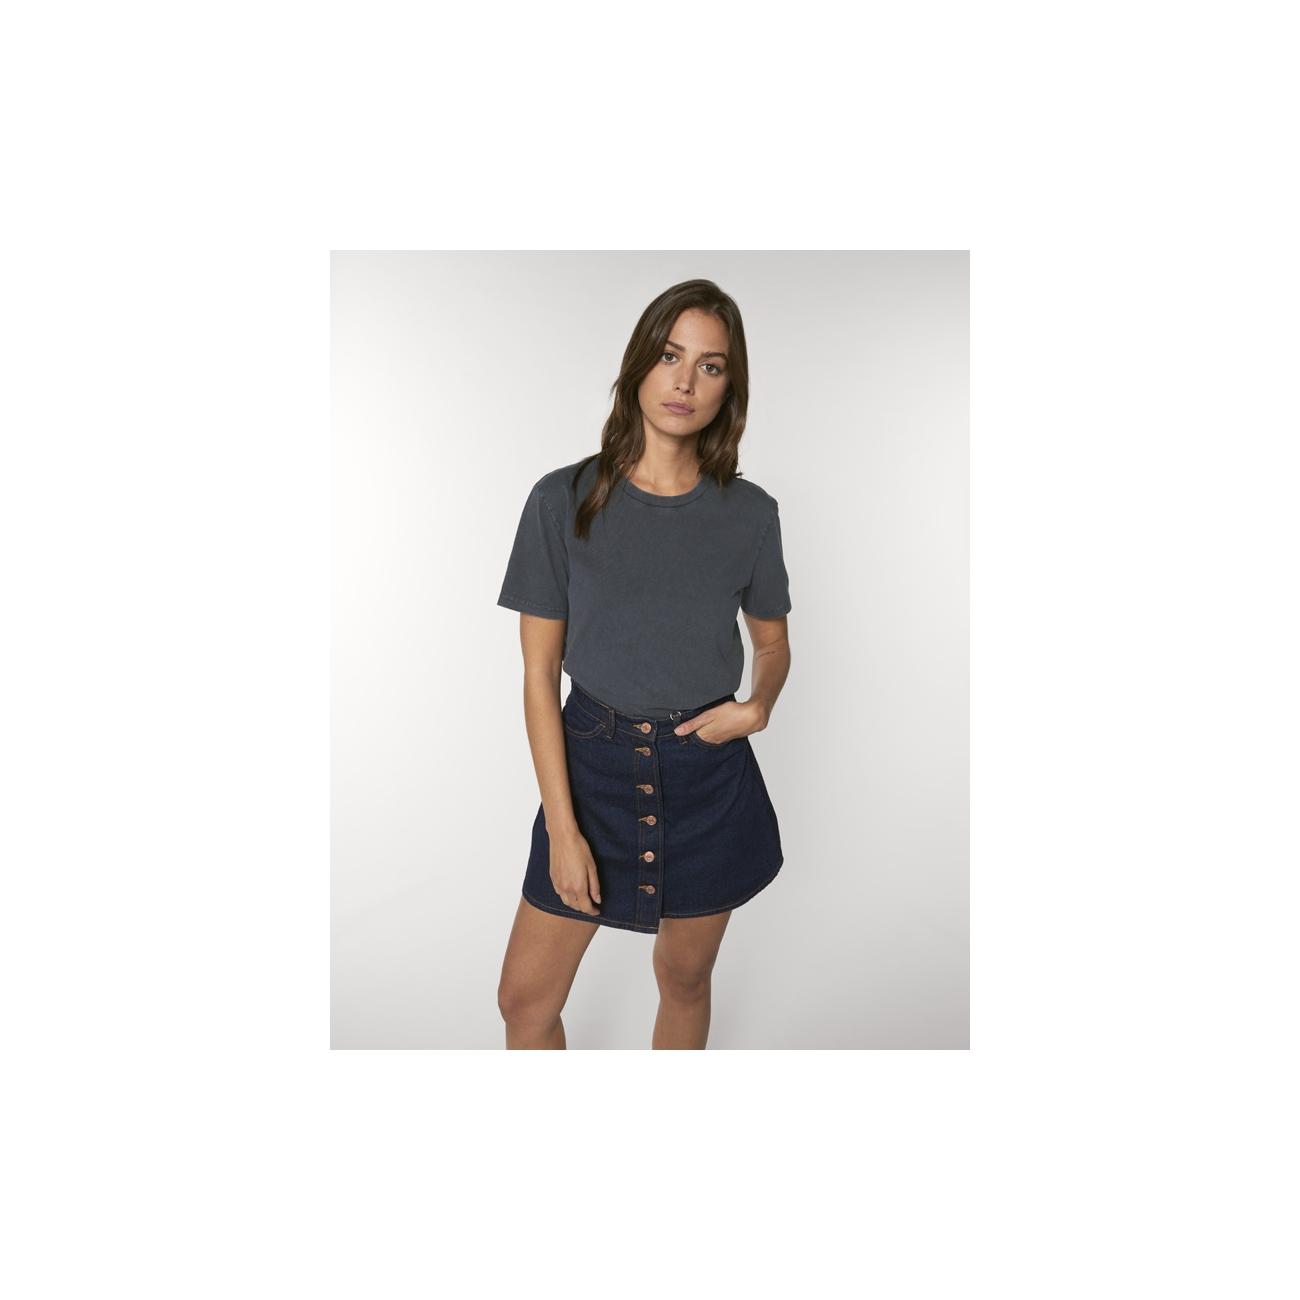 https://tee-shirt-bio.com/9723-thickbox_default/tee-shirt-vintage-coton-bio-femme-vintage-gris-indien.jpg